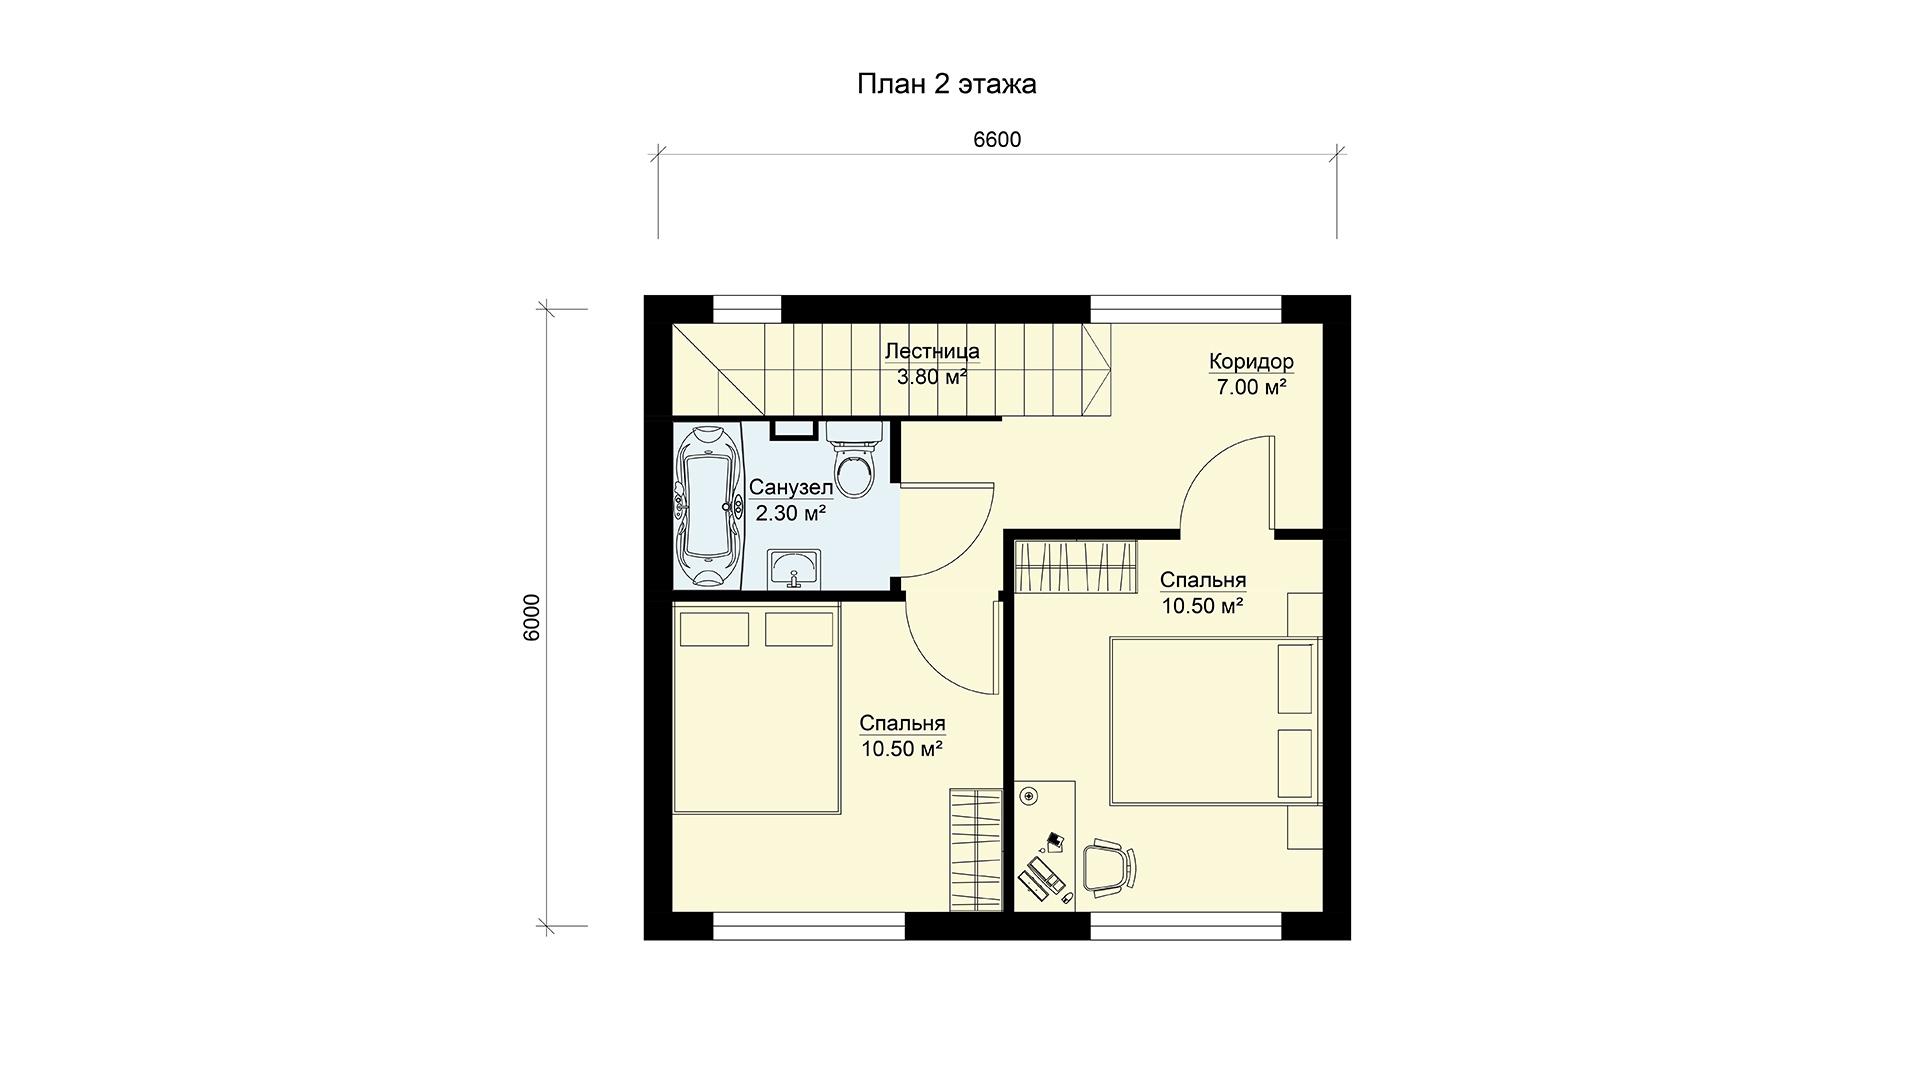 План второго этажа двухэтажного дома БЭНПАН, проект МС-69.